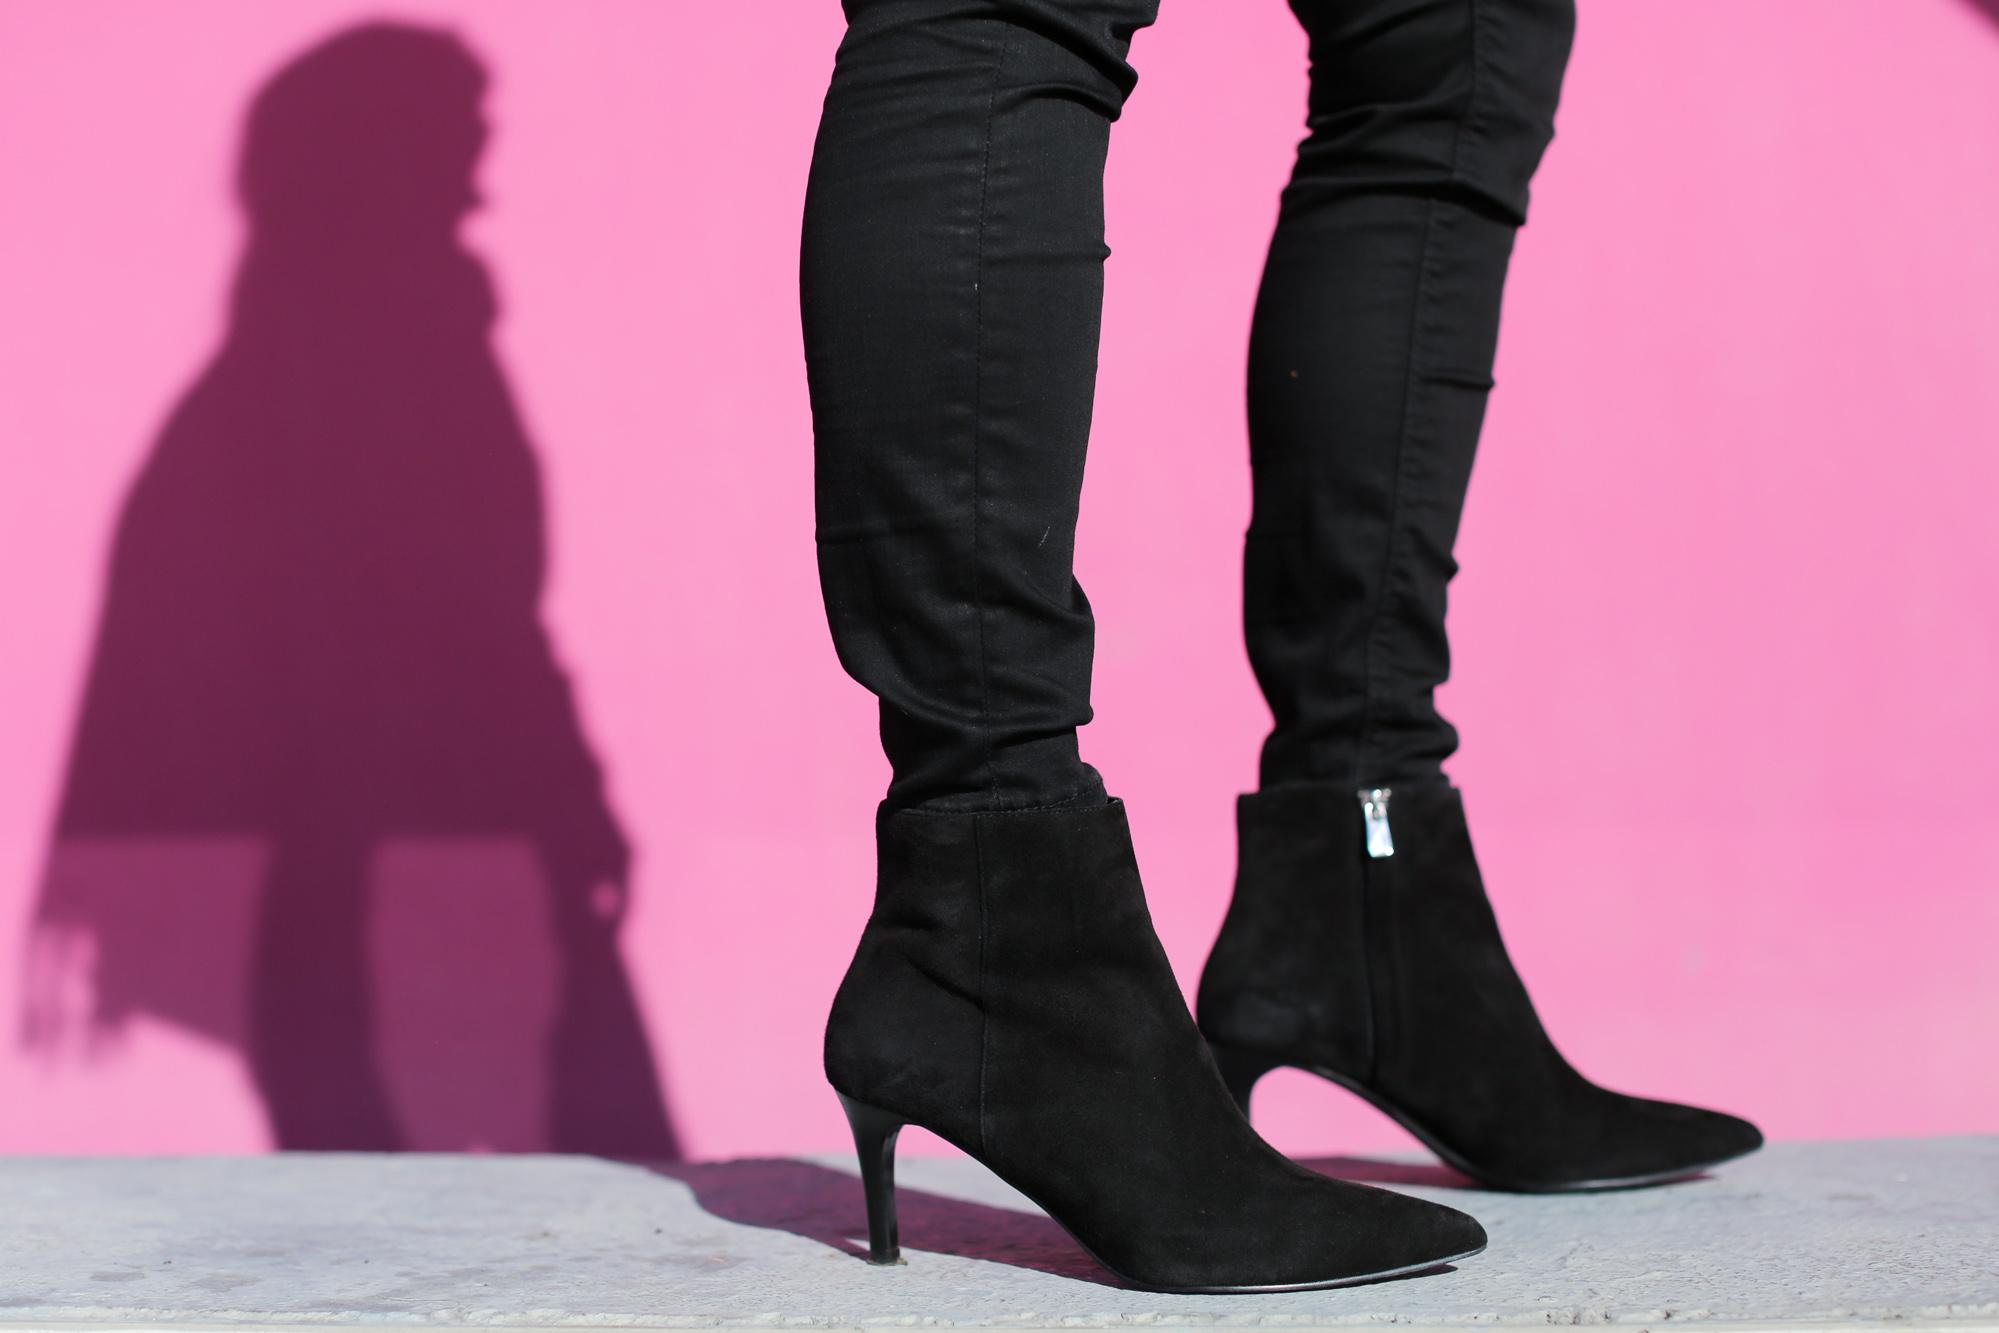 Clochet_fashionblogger_streetstyle_&otherstories_stilettoankleboots_burgundyheroscarf_metallicflowerssweater_titamadridspiga-5